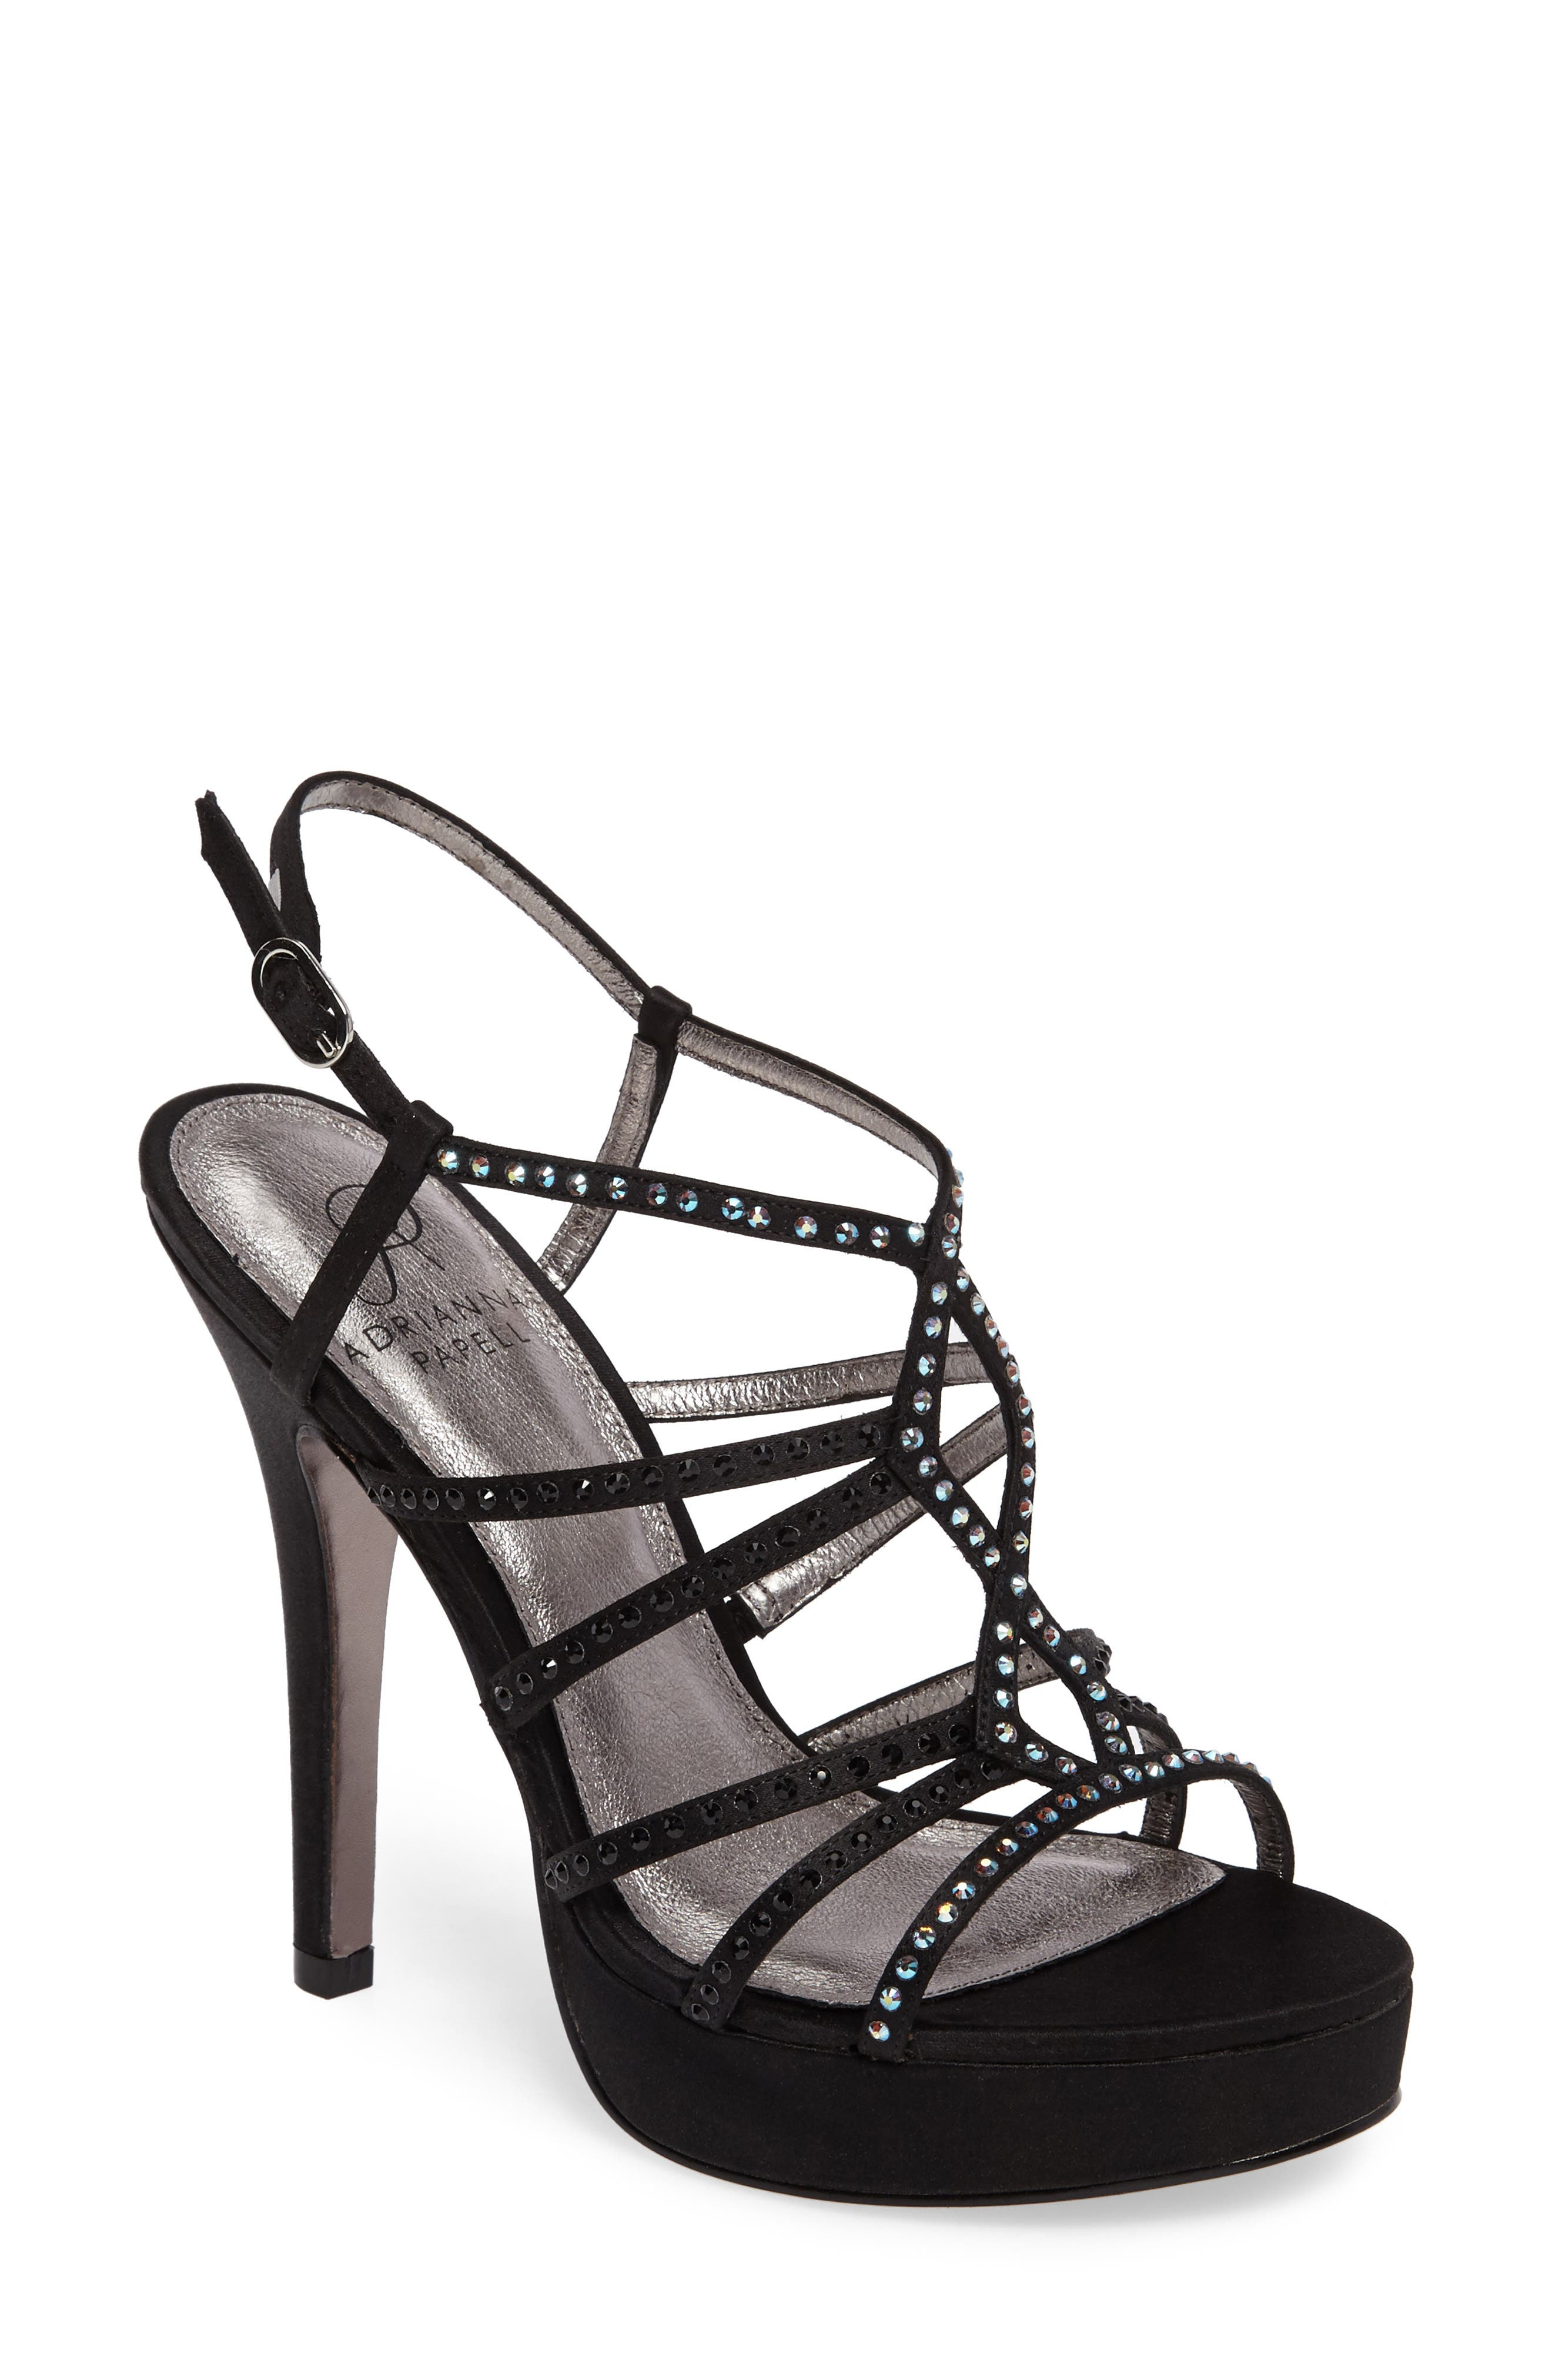 Main Image - Adrianna Papell Miranda Embellished Platform Sandal (Women)